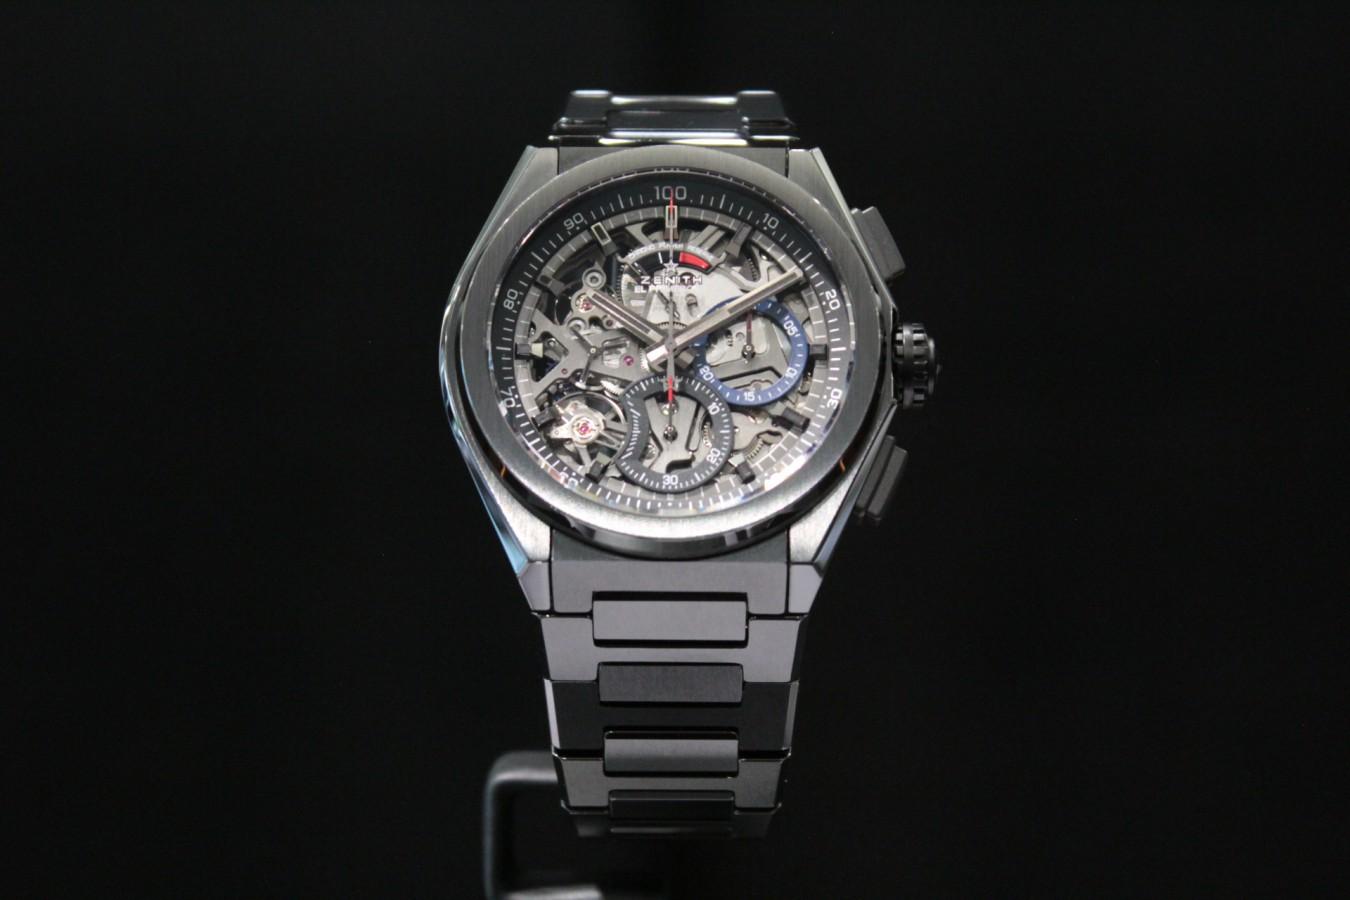 IMG_4168 高級感と使い易さを備えたオールブラックモデル【デファイ エル・プリメロ21】 - DEFY